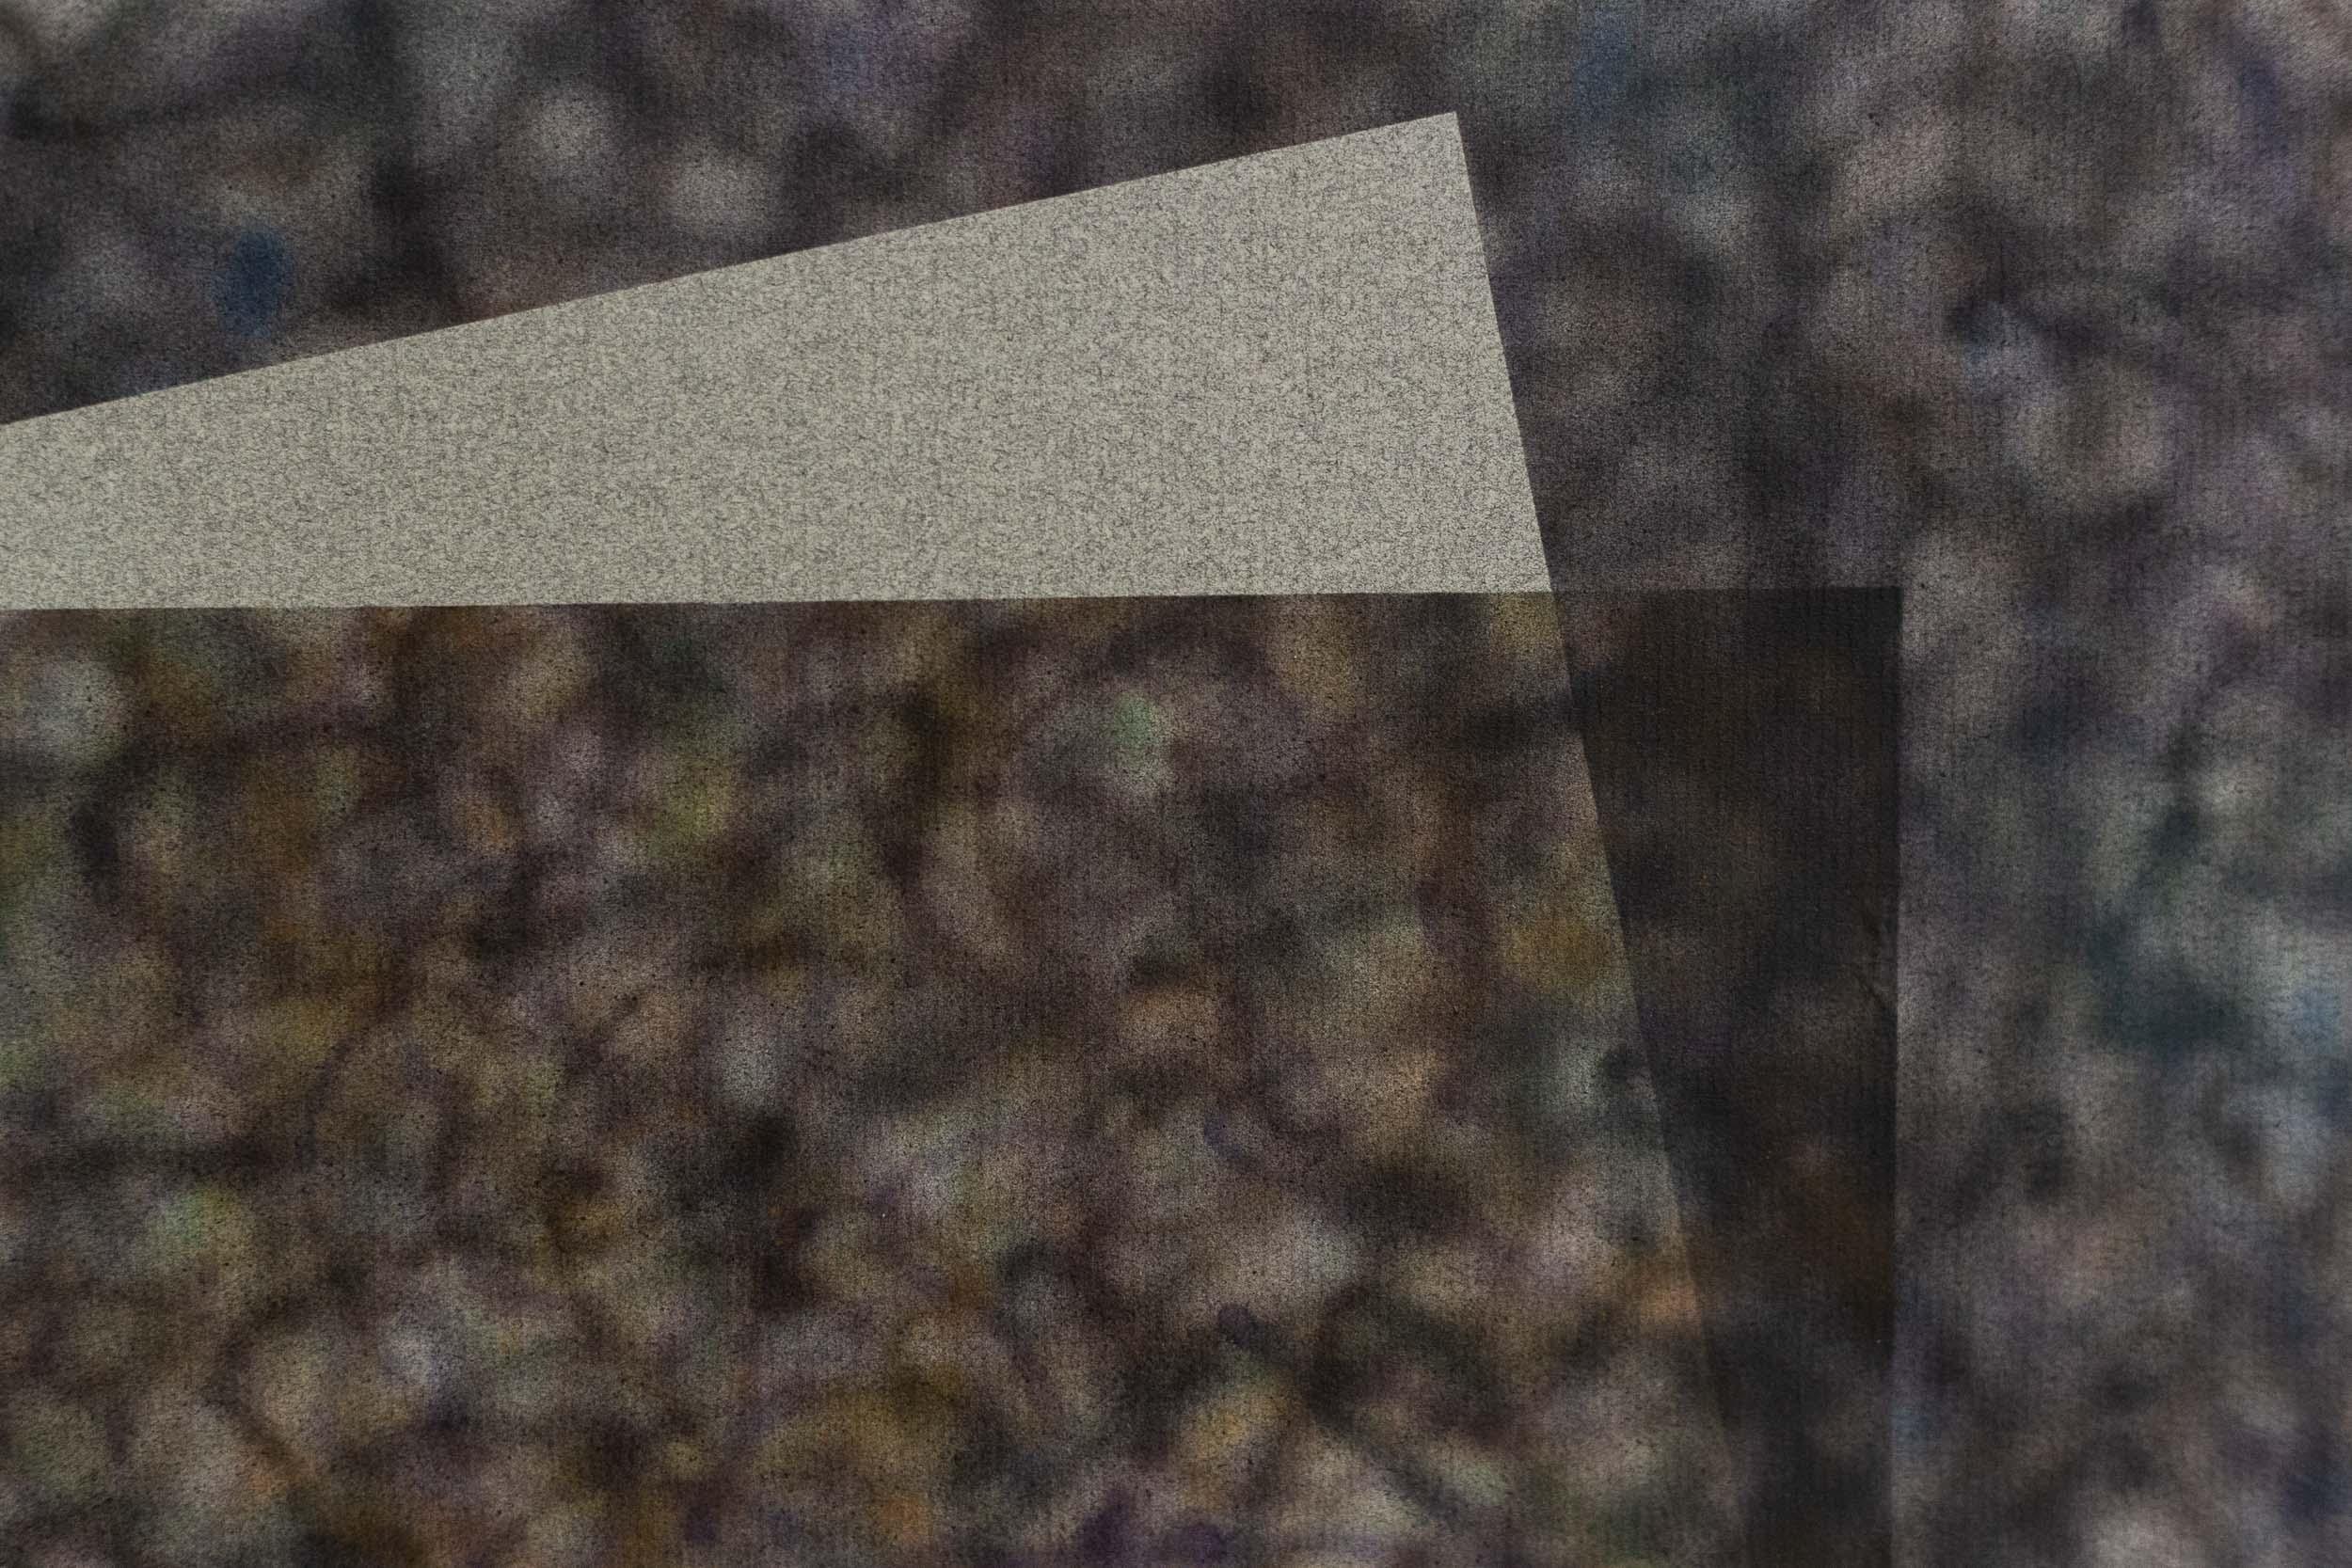 Eduardo Rubén,  Untitled  (from Windows series, detail), 1985, acrylic on paper, 35 x 55 cm  Photo: Kilian Bannwart